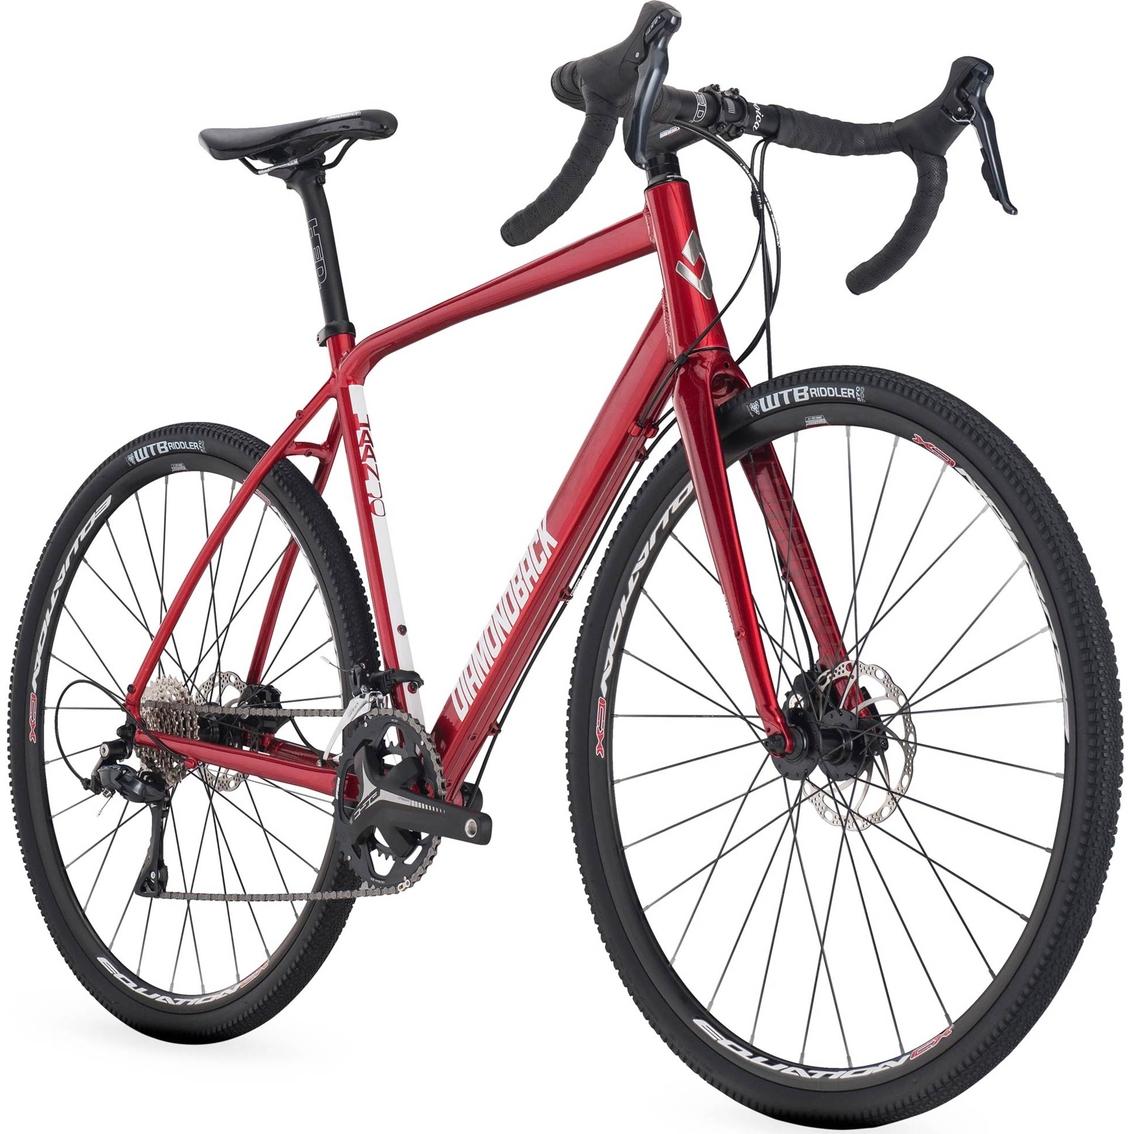 352358415c8 Diamondback Haanjo 3 Road Bike | Adult Bikes | Sports & Outdoors ...